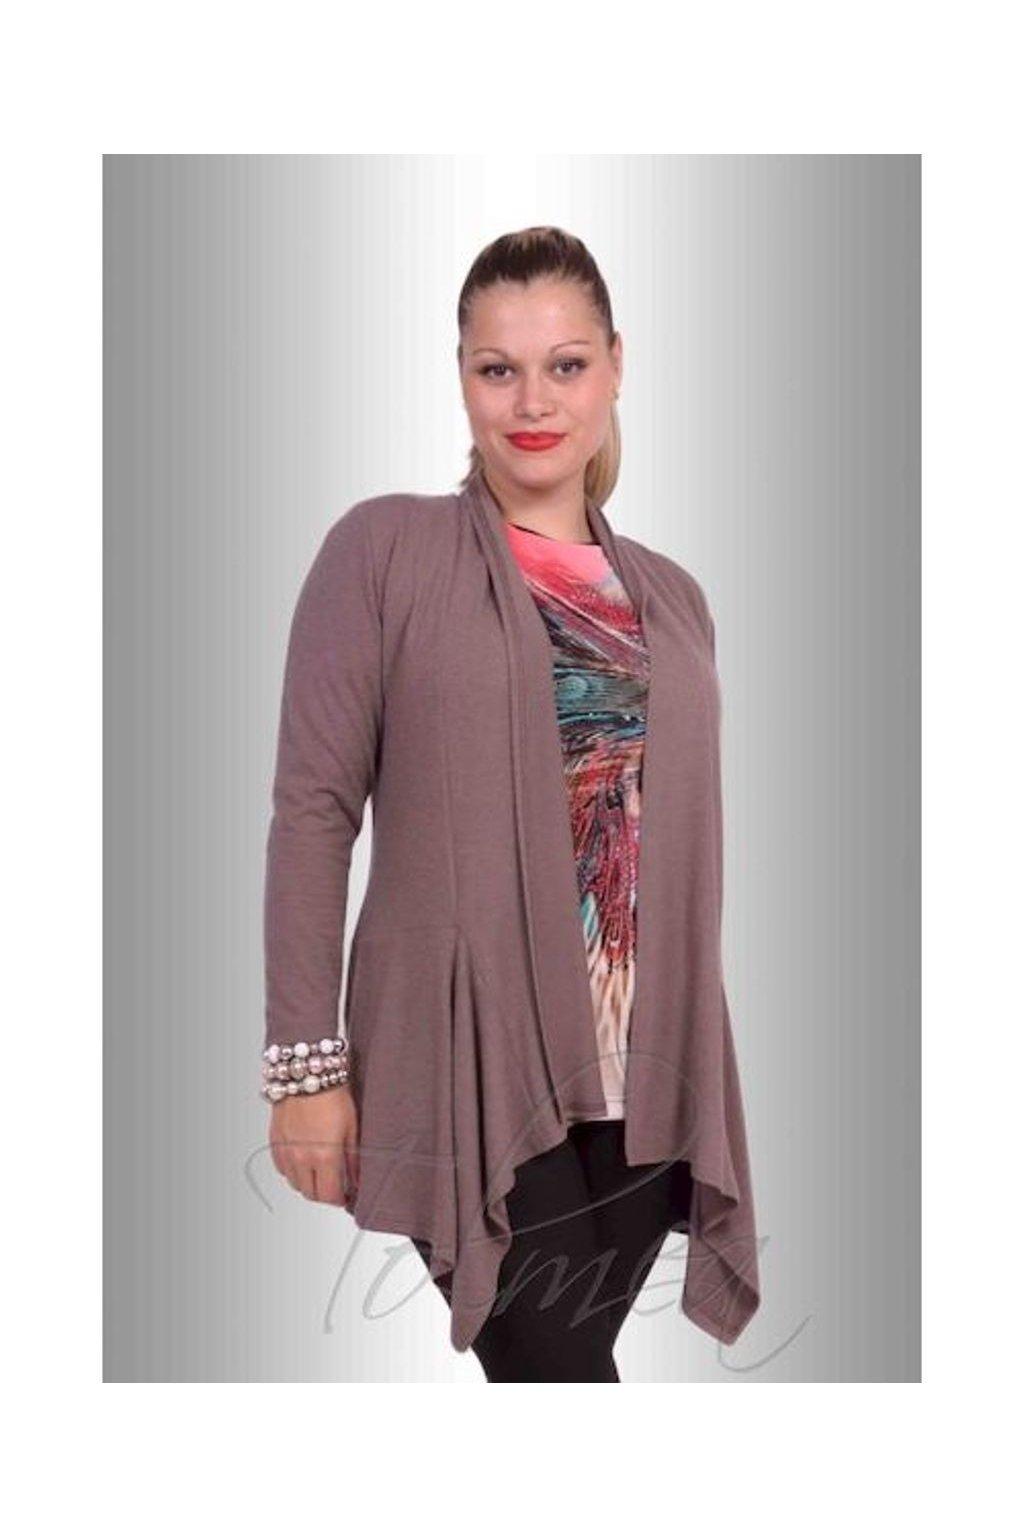 Kabátek angora cíp 7915 (Velikost 38, Barva Béžová)